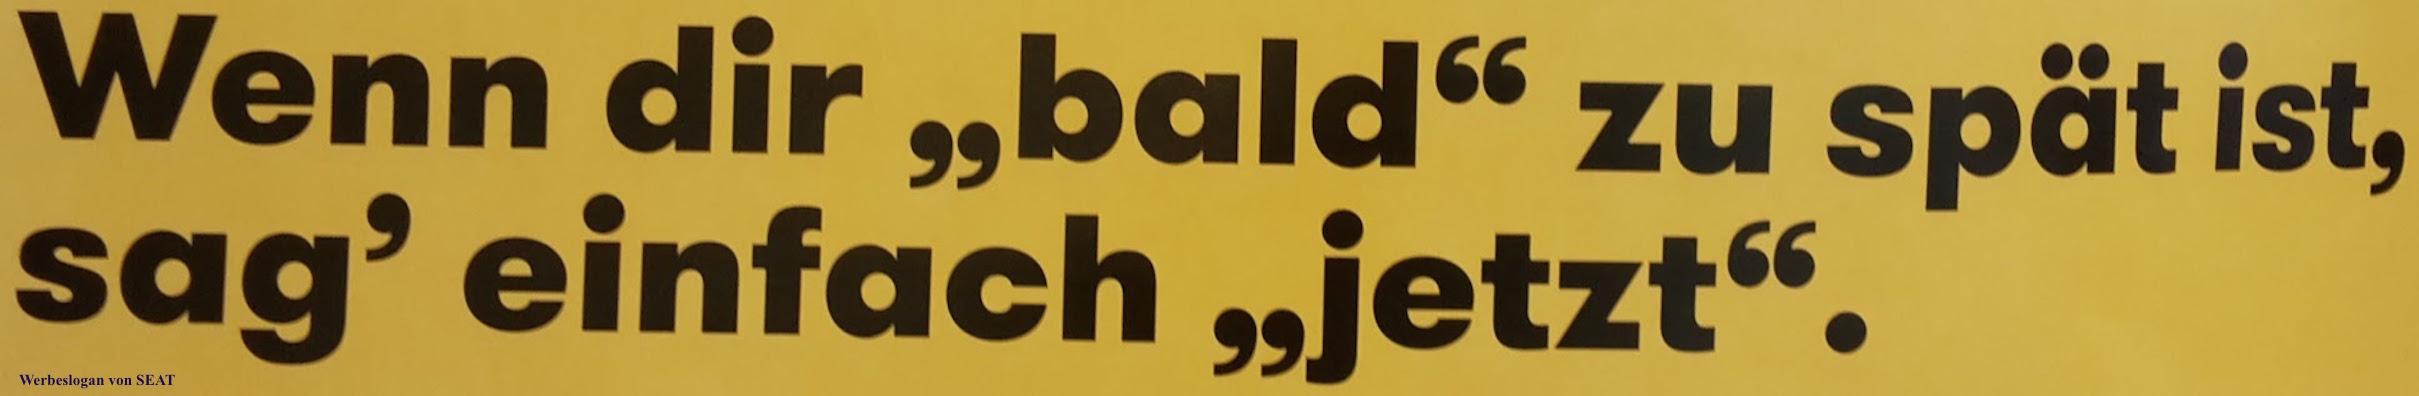 Zitat Jetzt _ Bald